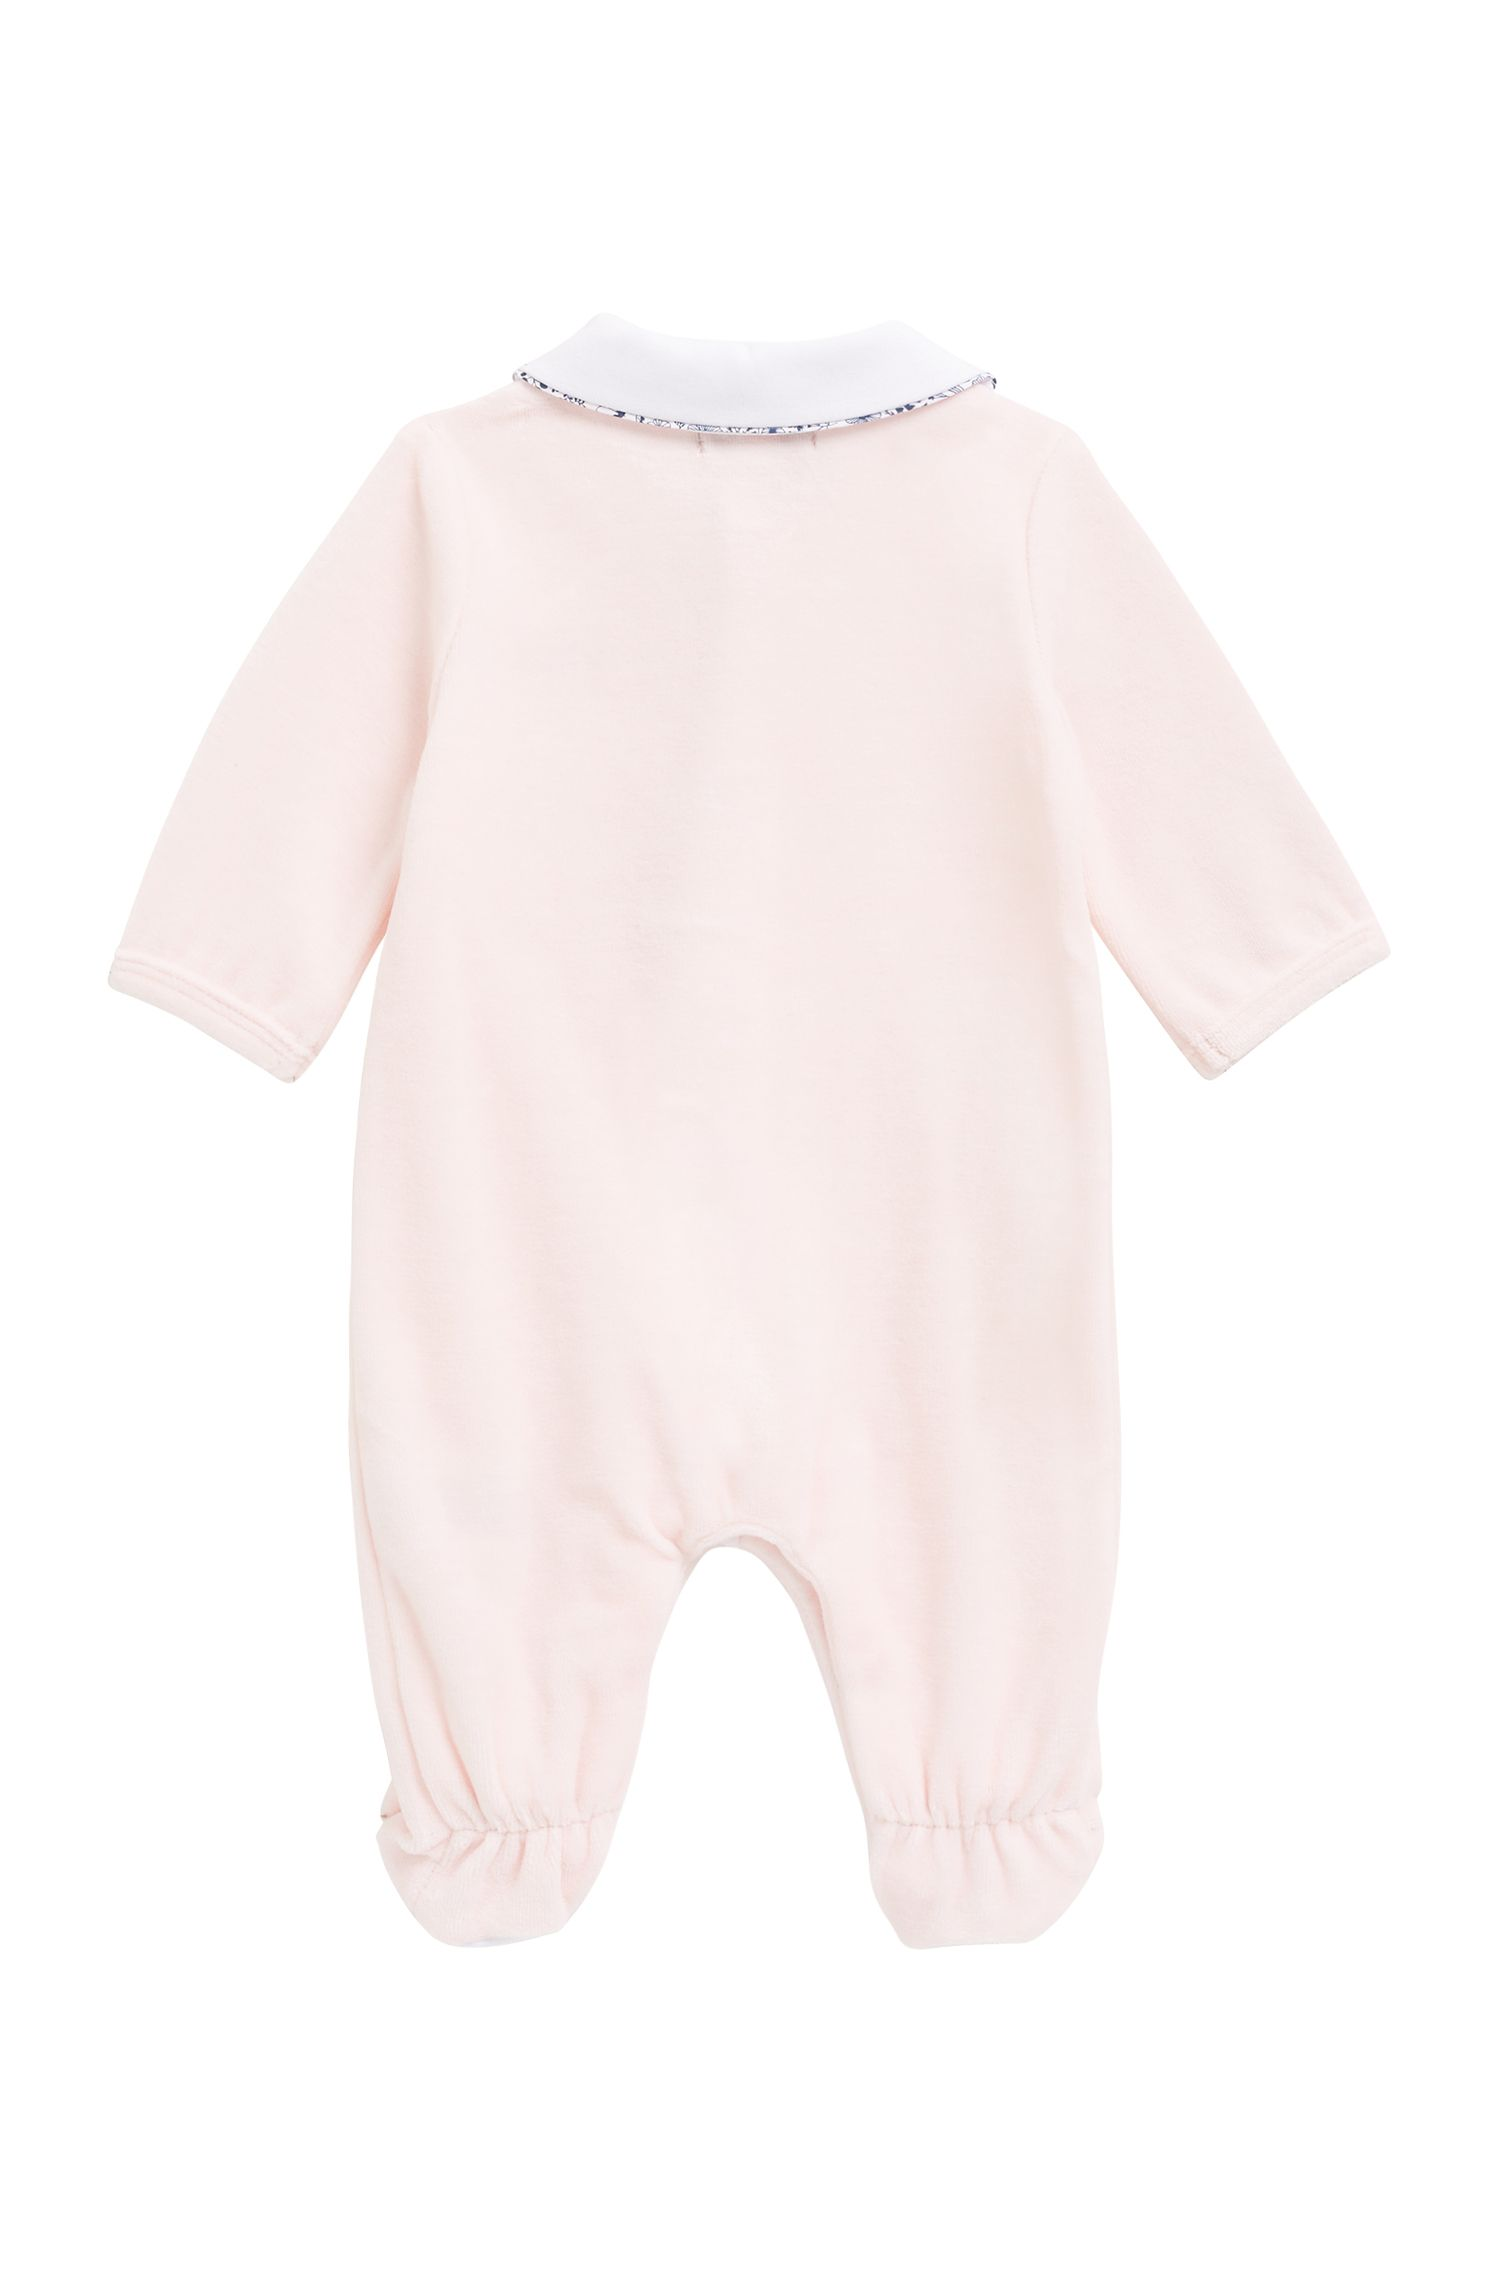 Baby-Pyjama aus Terry mit Samt-Finish, Hellrosa